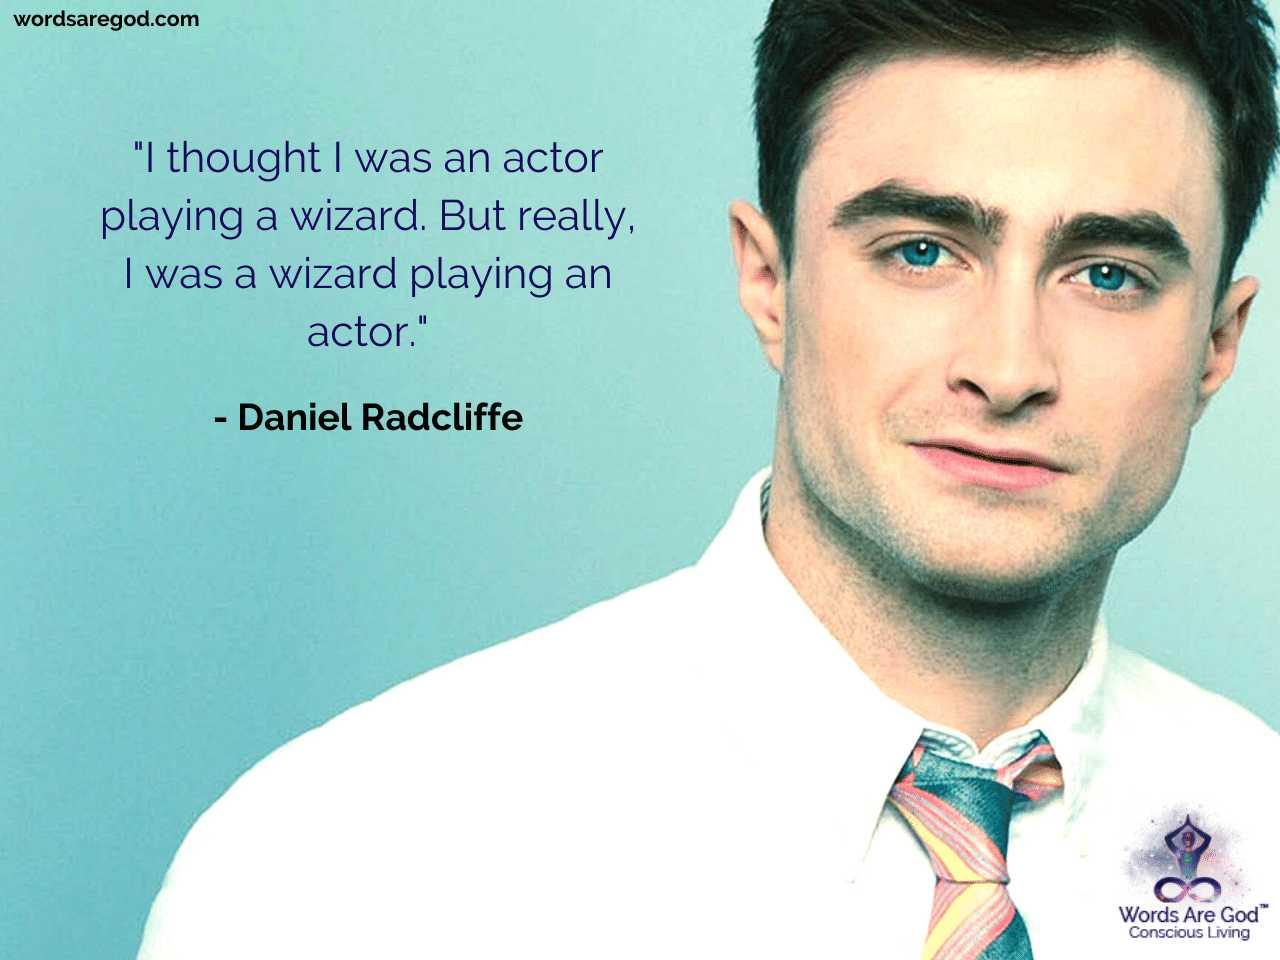 Daniel Radcliffe Quotes Motivational Quotes For Life Motivational Quotes English Motivational Quotes Life